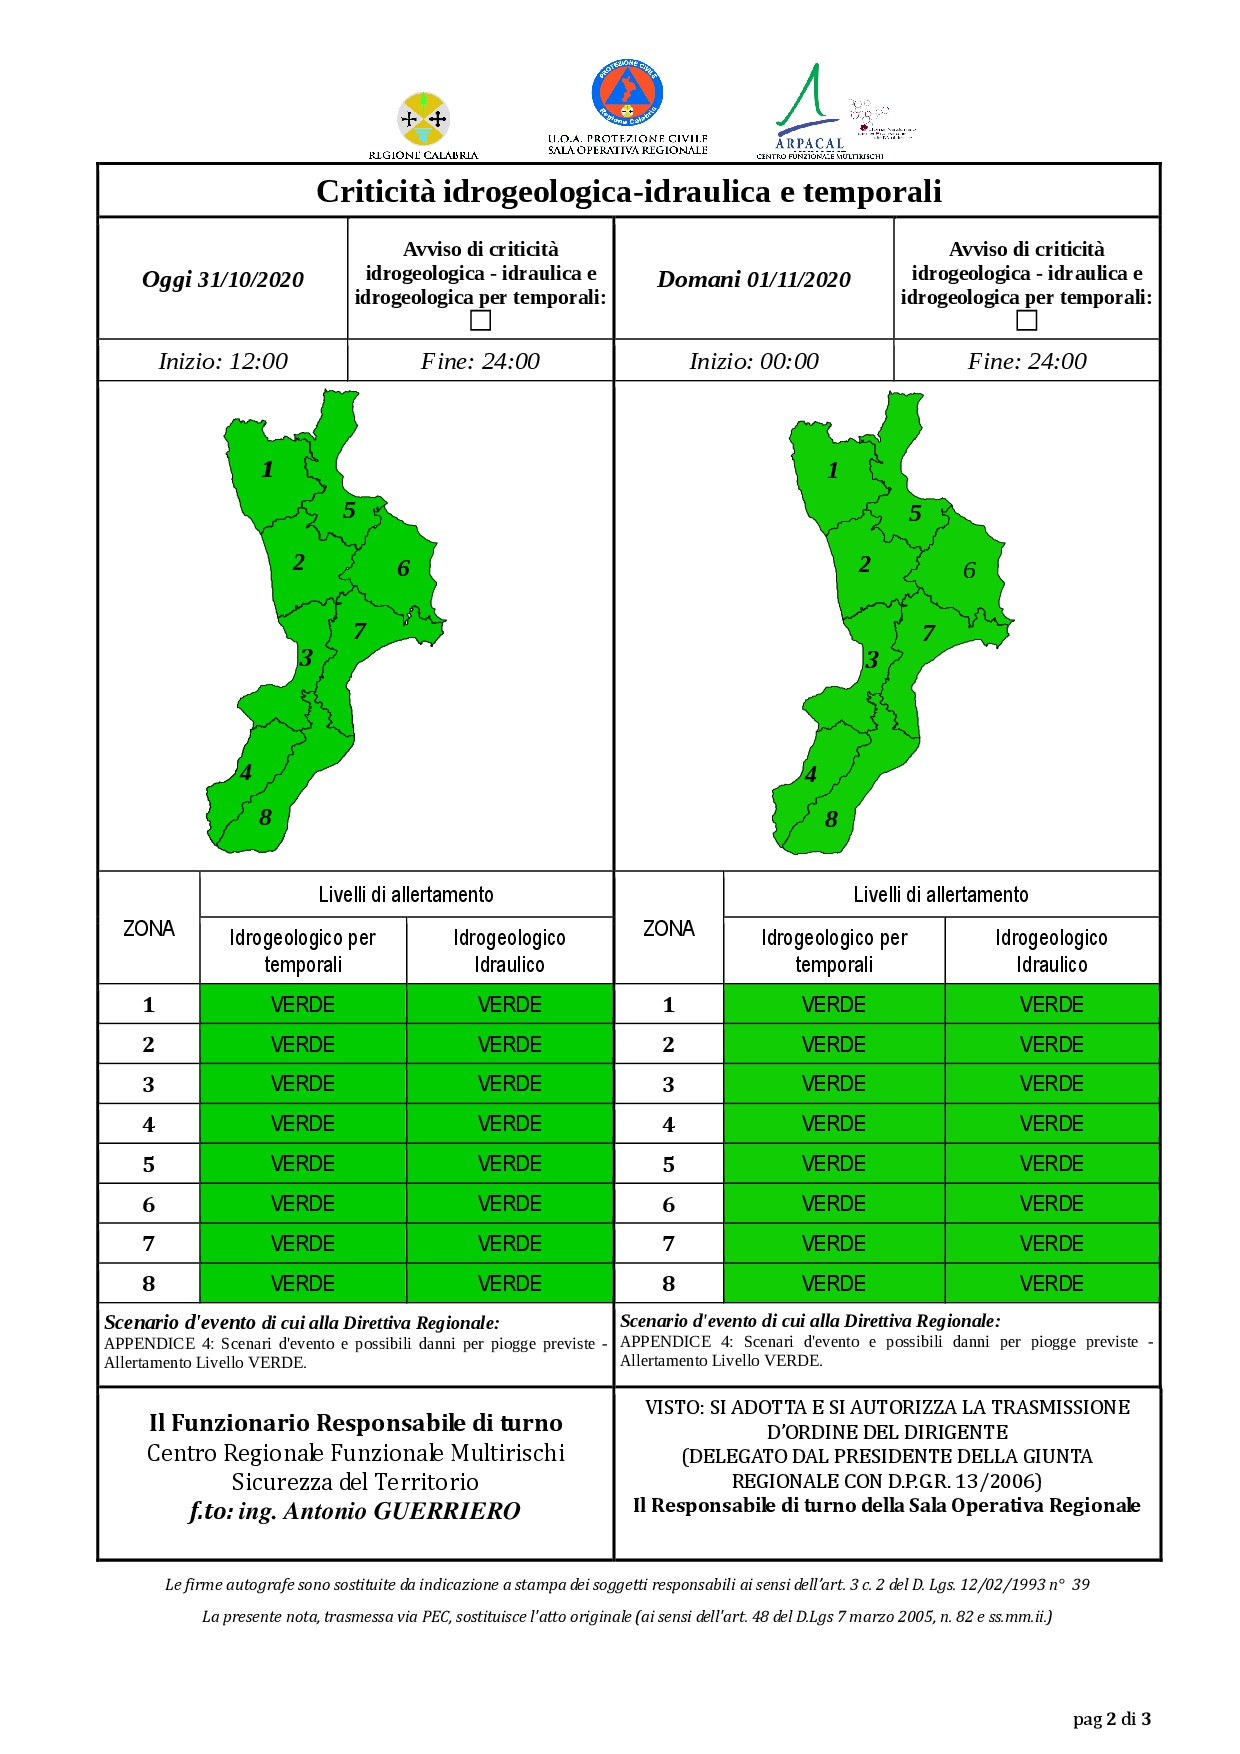 Criticità idrogeologica-idraulica e temporali in Calabria 31-10-2020